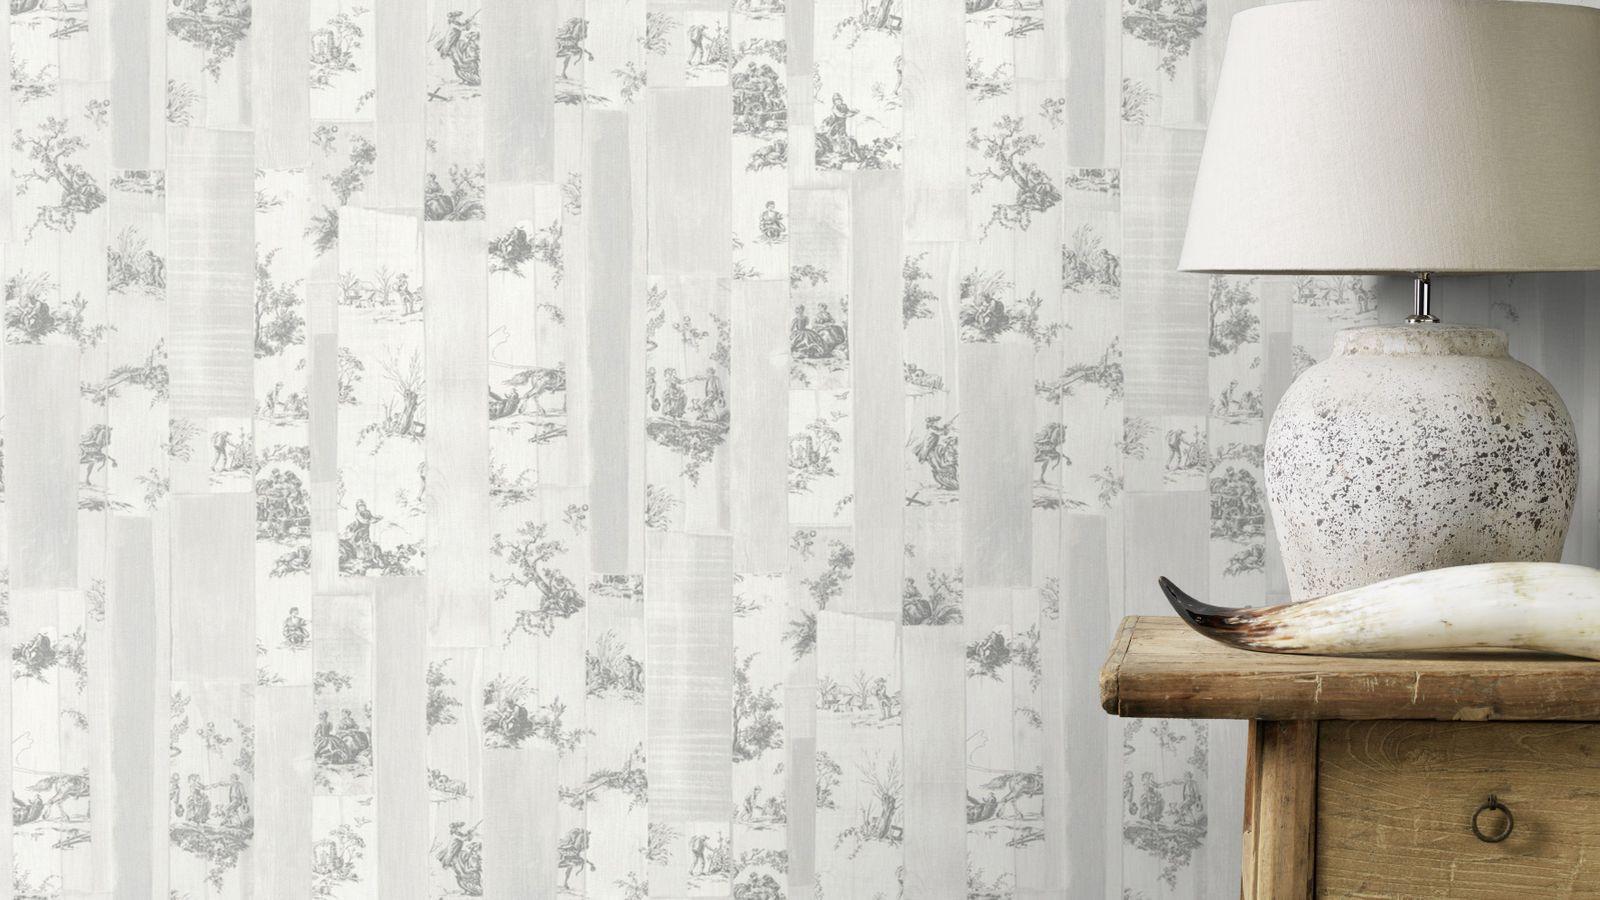 tapete vlies toile de jouy beigegrau grau rasch souvenir. Black Bedroom Furniture Sets. Home Design Ideas